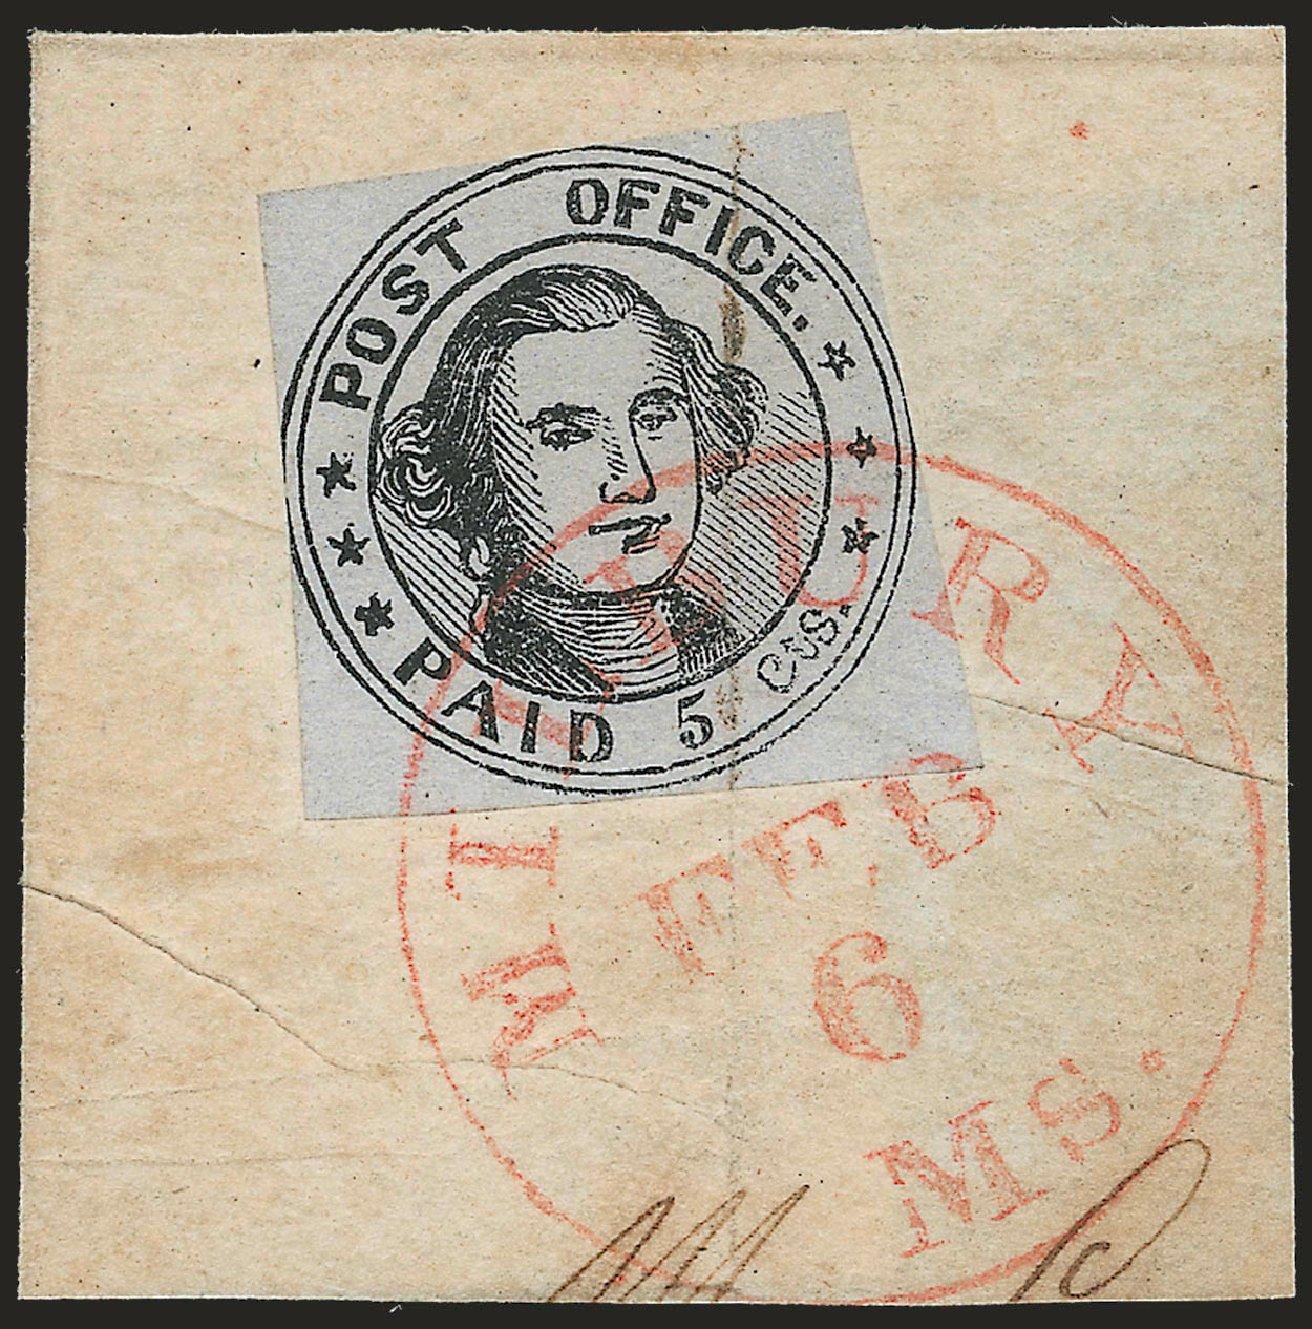 Values of US Stamp Scott Cat. # 7X1 - 1846 5c Millbury Postmasters Provisional. Robert Siegel Auction Galleries, Jun 2010, Sale 989, Lot 34